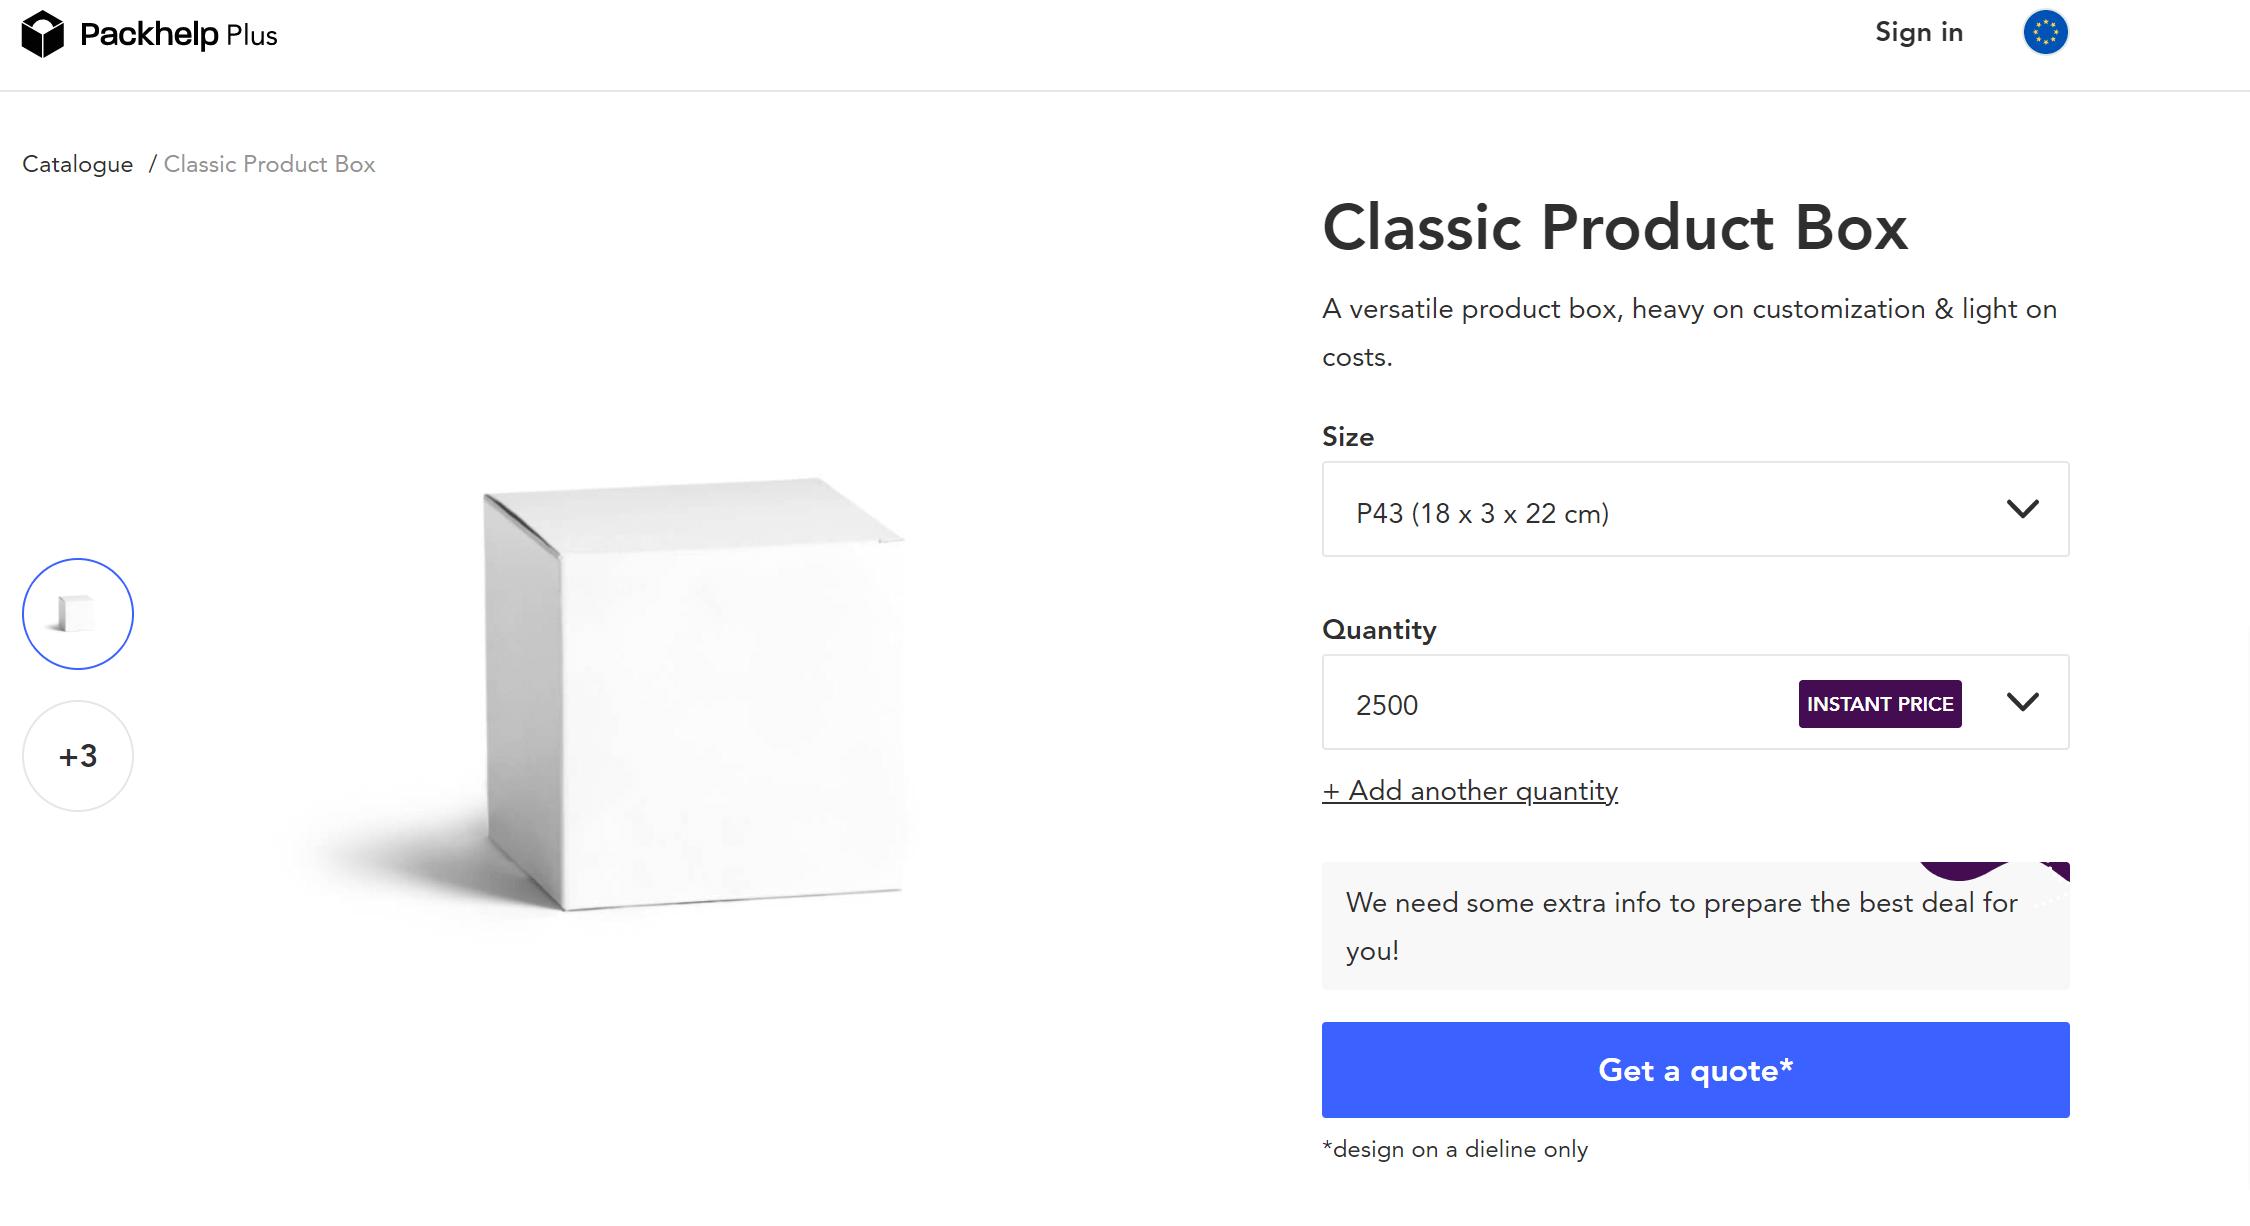 Configuration of Packhelp Plus Product Page